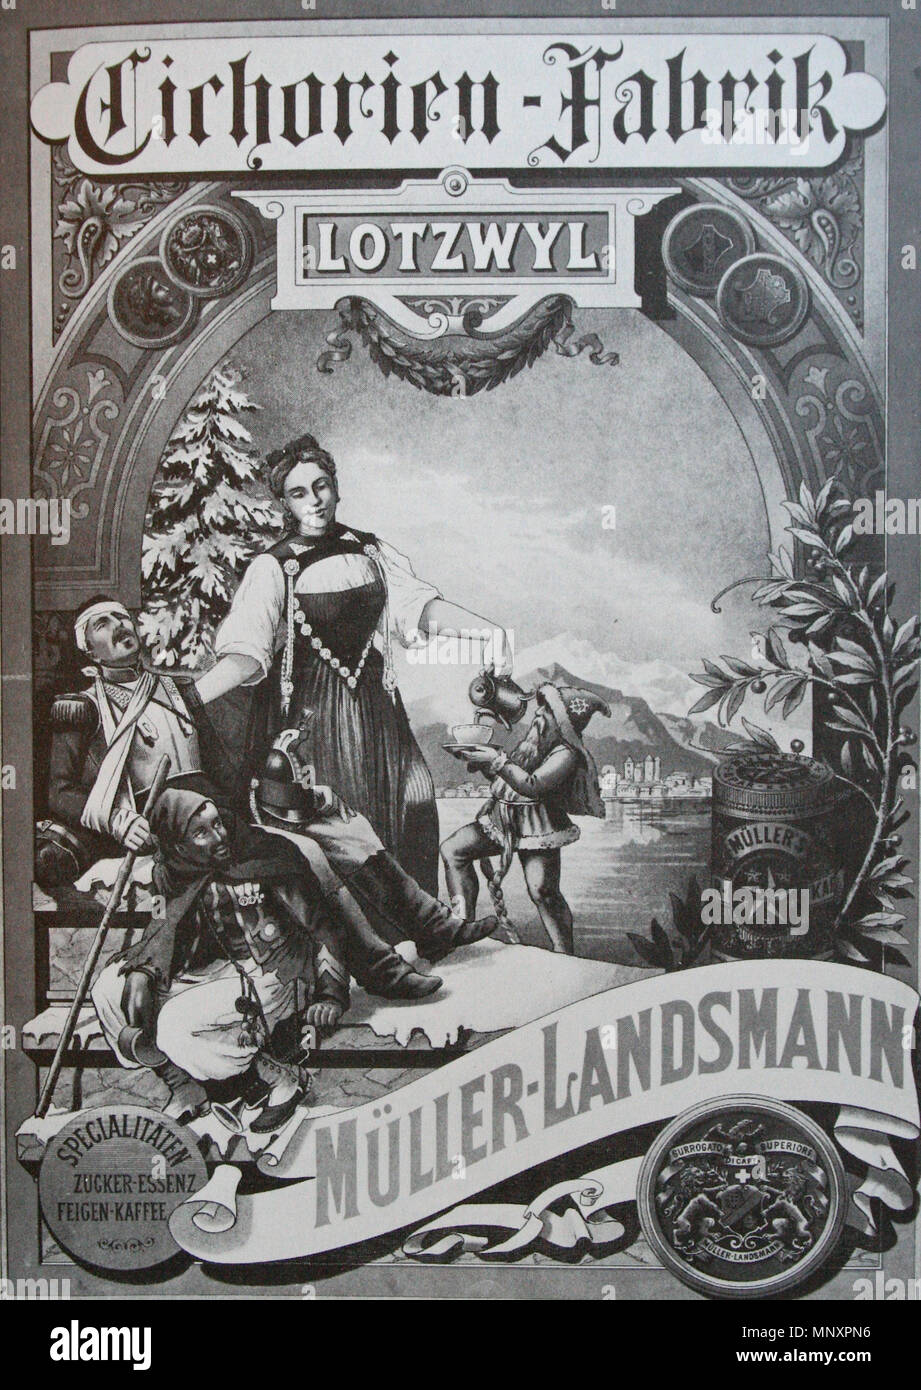 . Reklameplakat von Karl Jauslin, Chromolithografie, 63x48.5 cm . upload Januar 2009.   708 Jauslin Reklameplakat - Stock Image